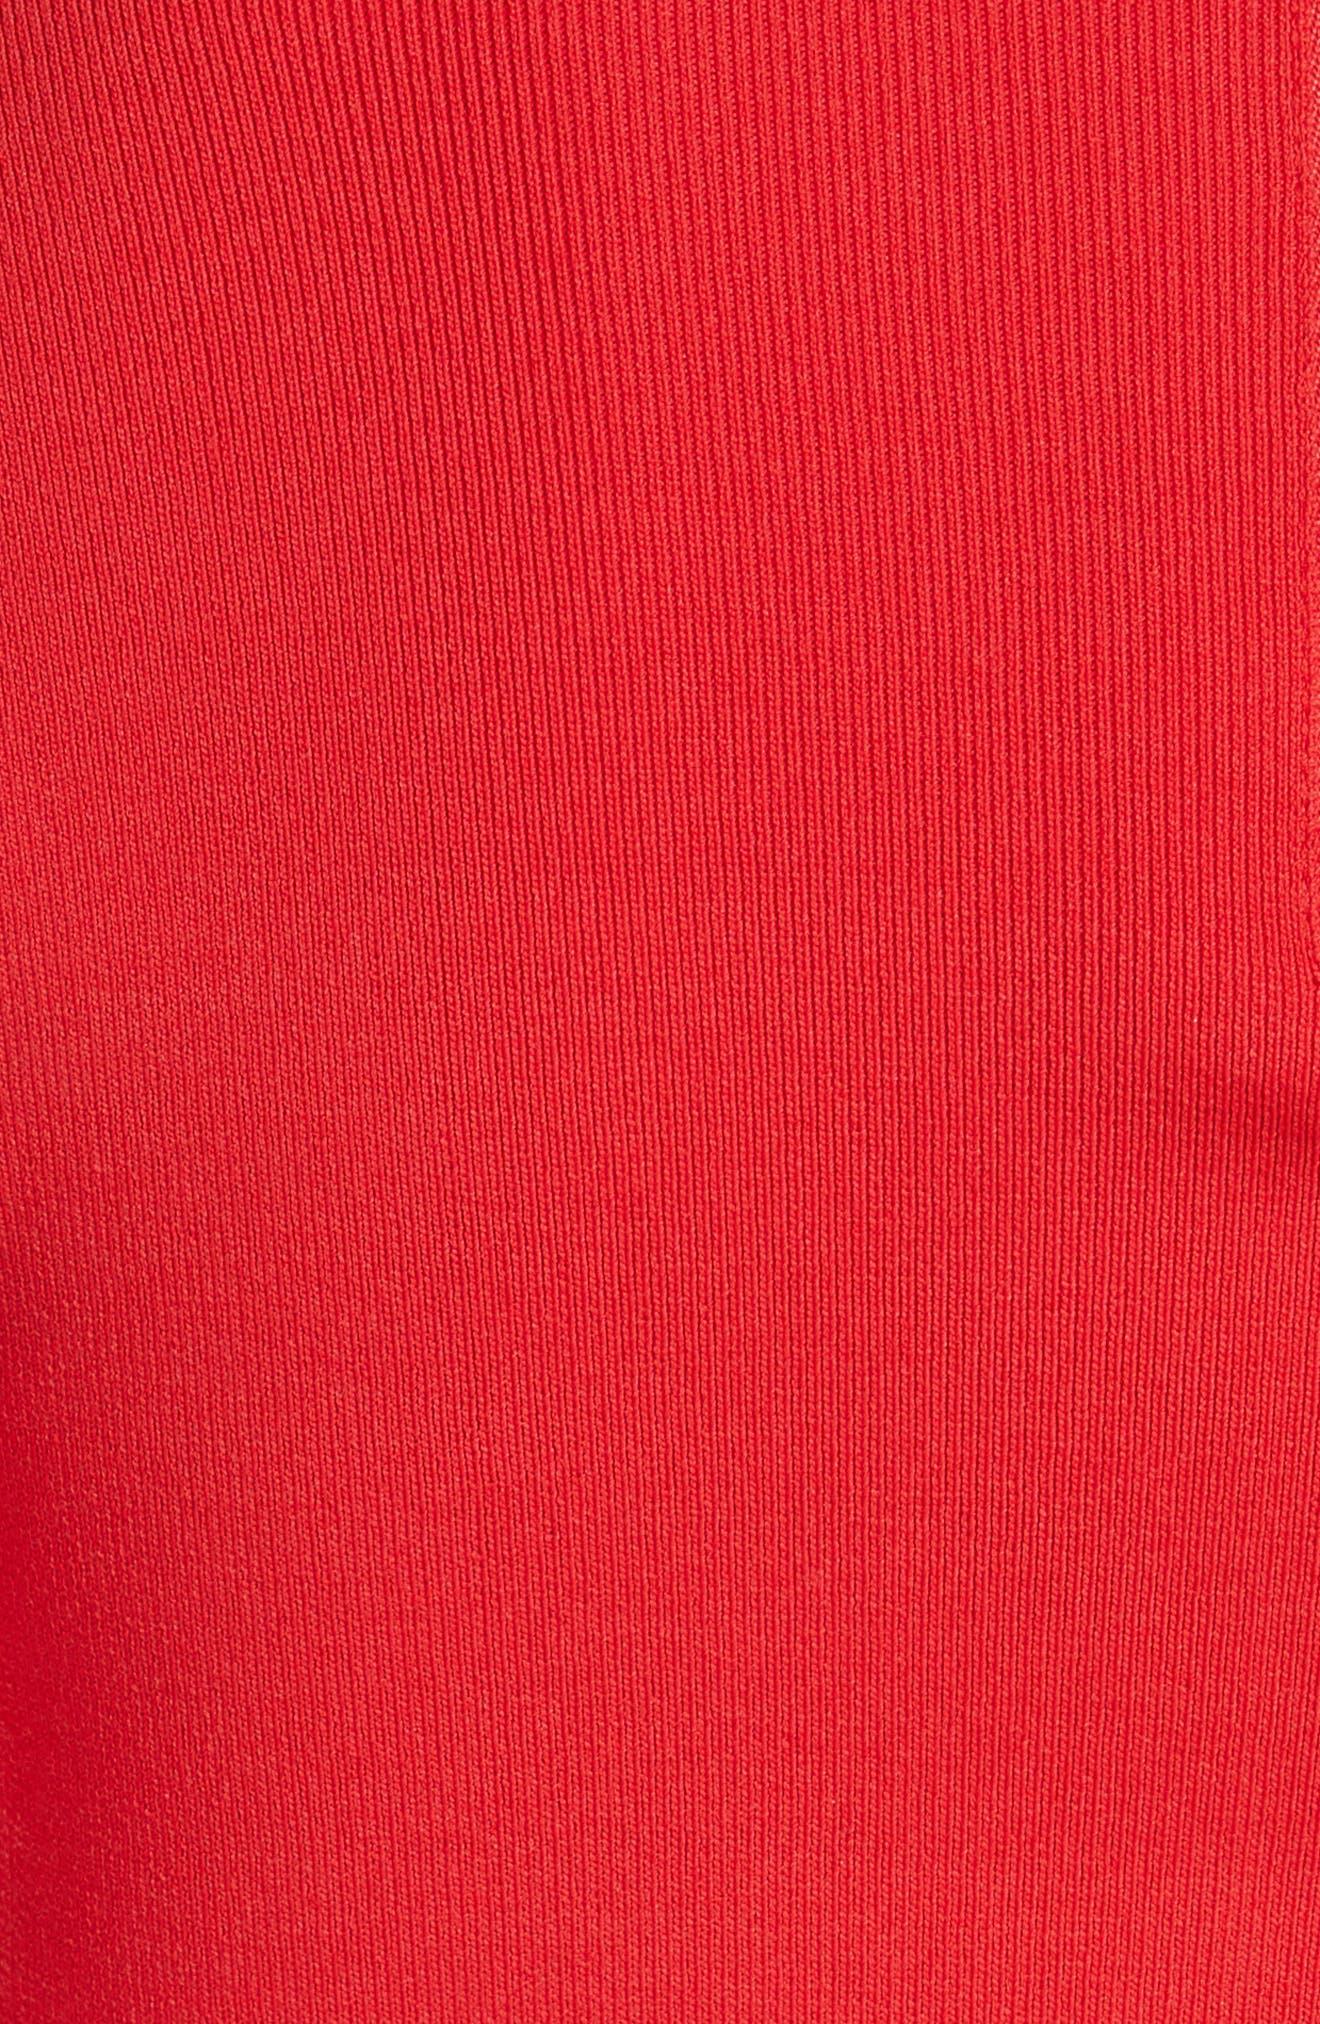 Yonoh Cutout Sleeve Sweater,                             Alternate thumbnail 5, color,                             600